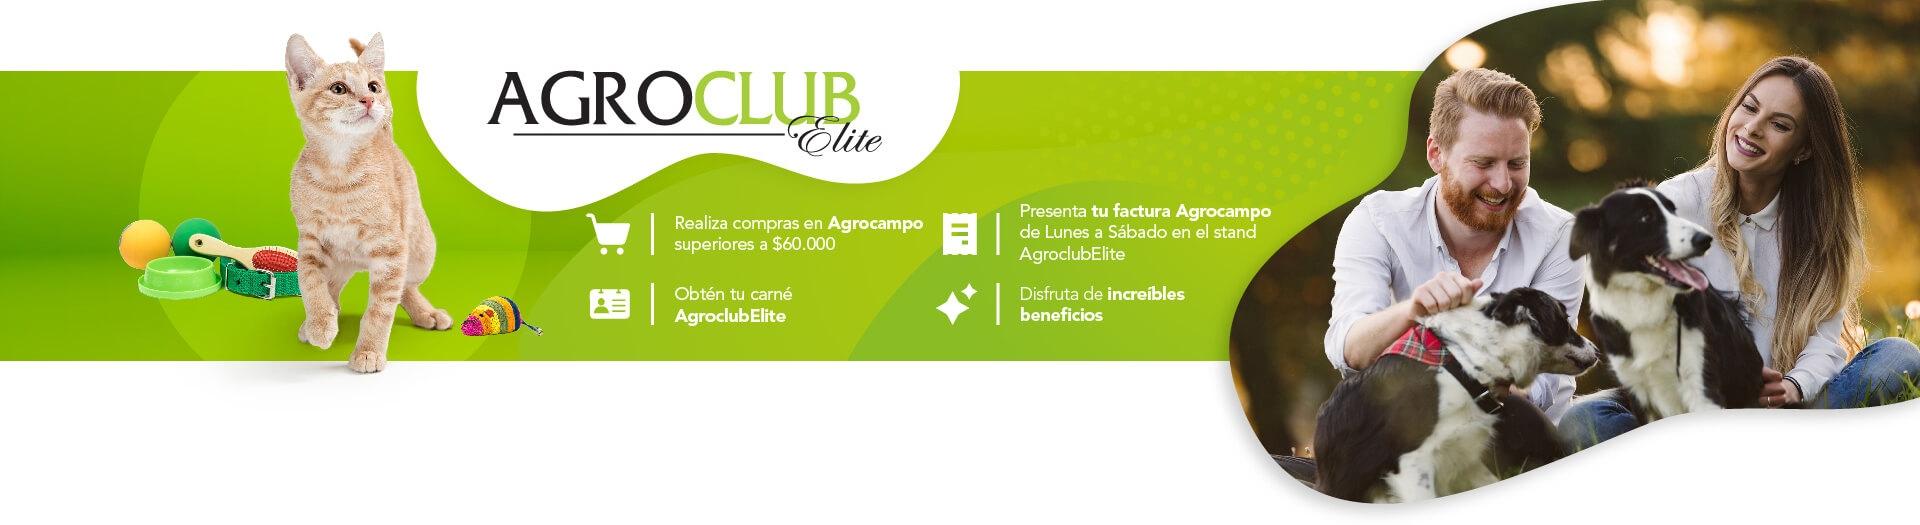 Agroclub Elite